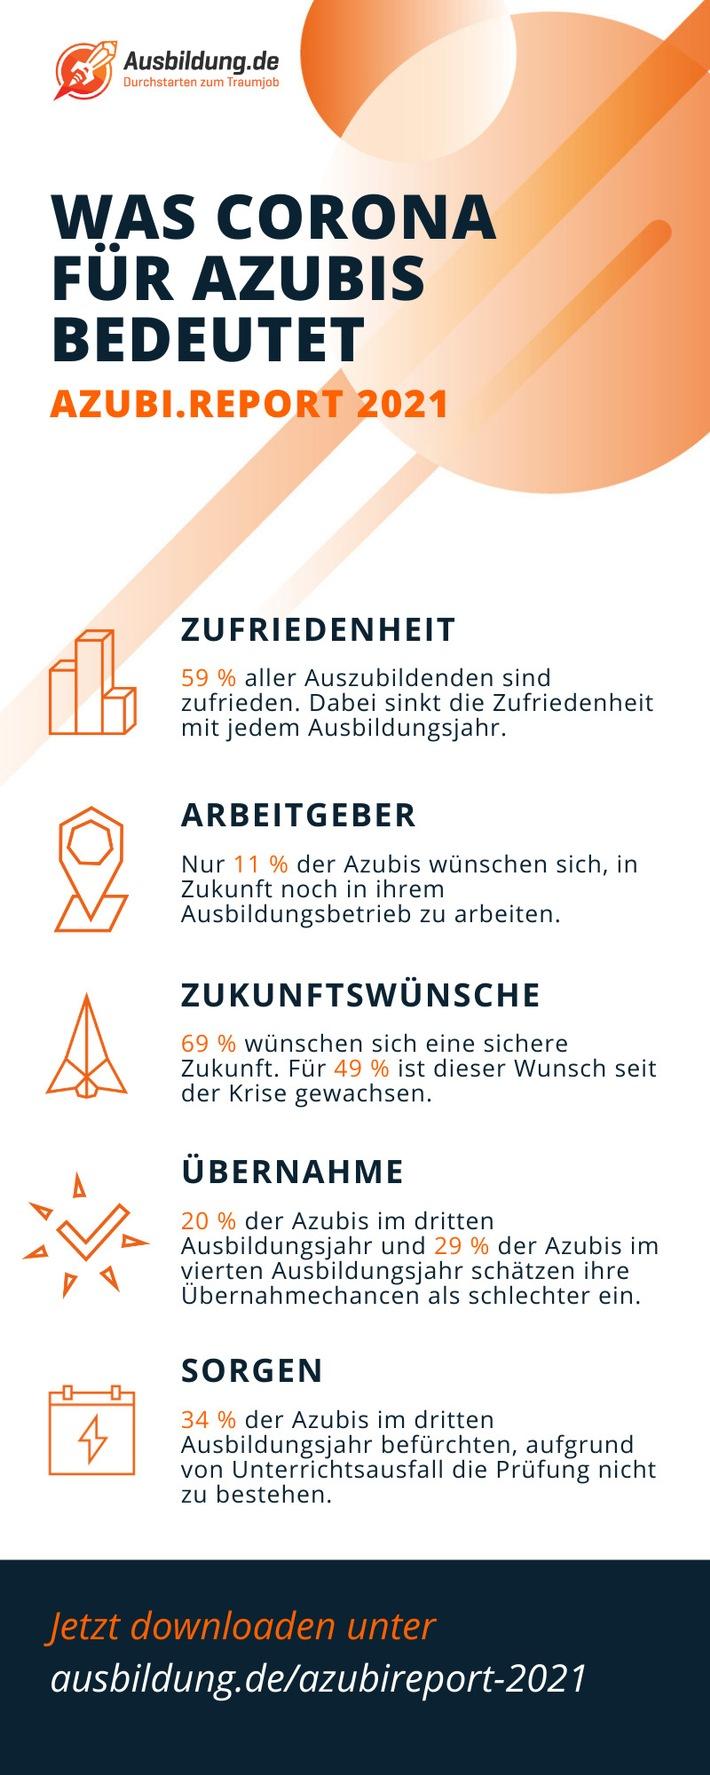 Pressemitteilung azubi.report 2021